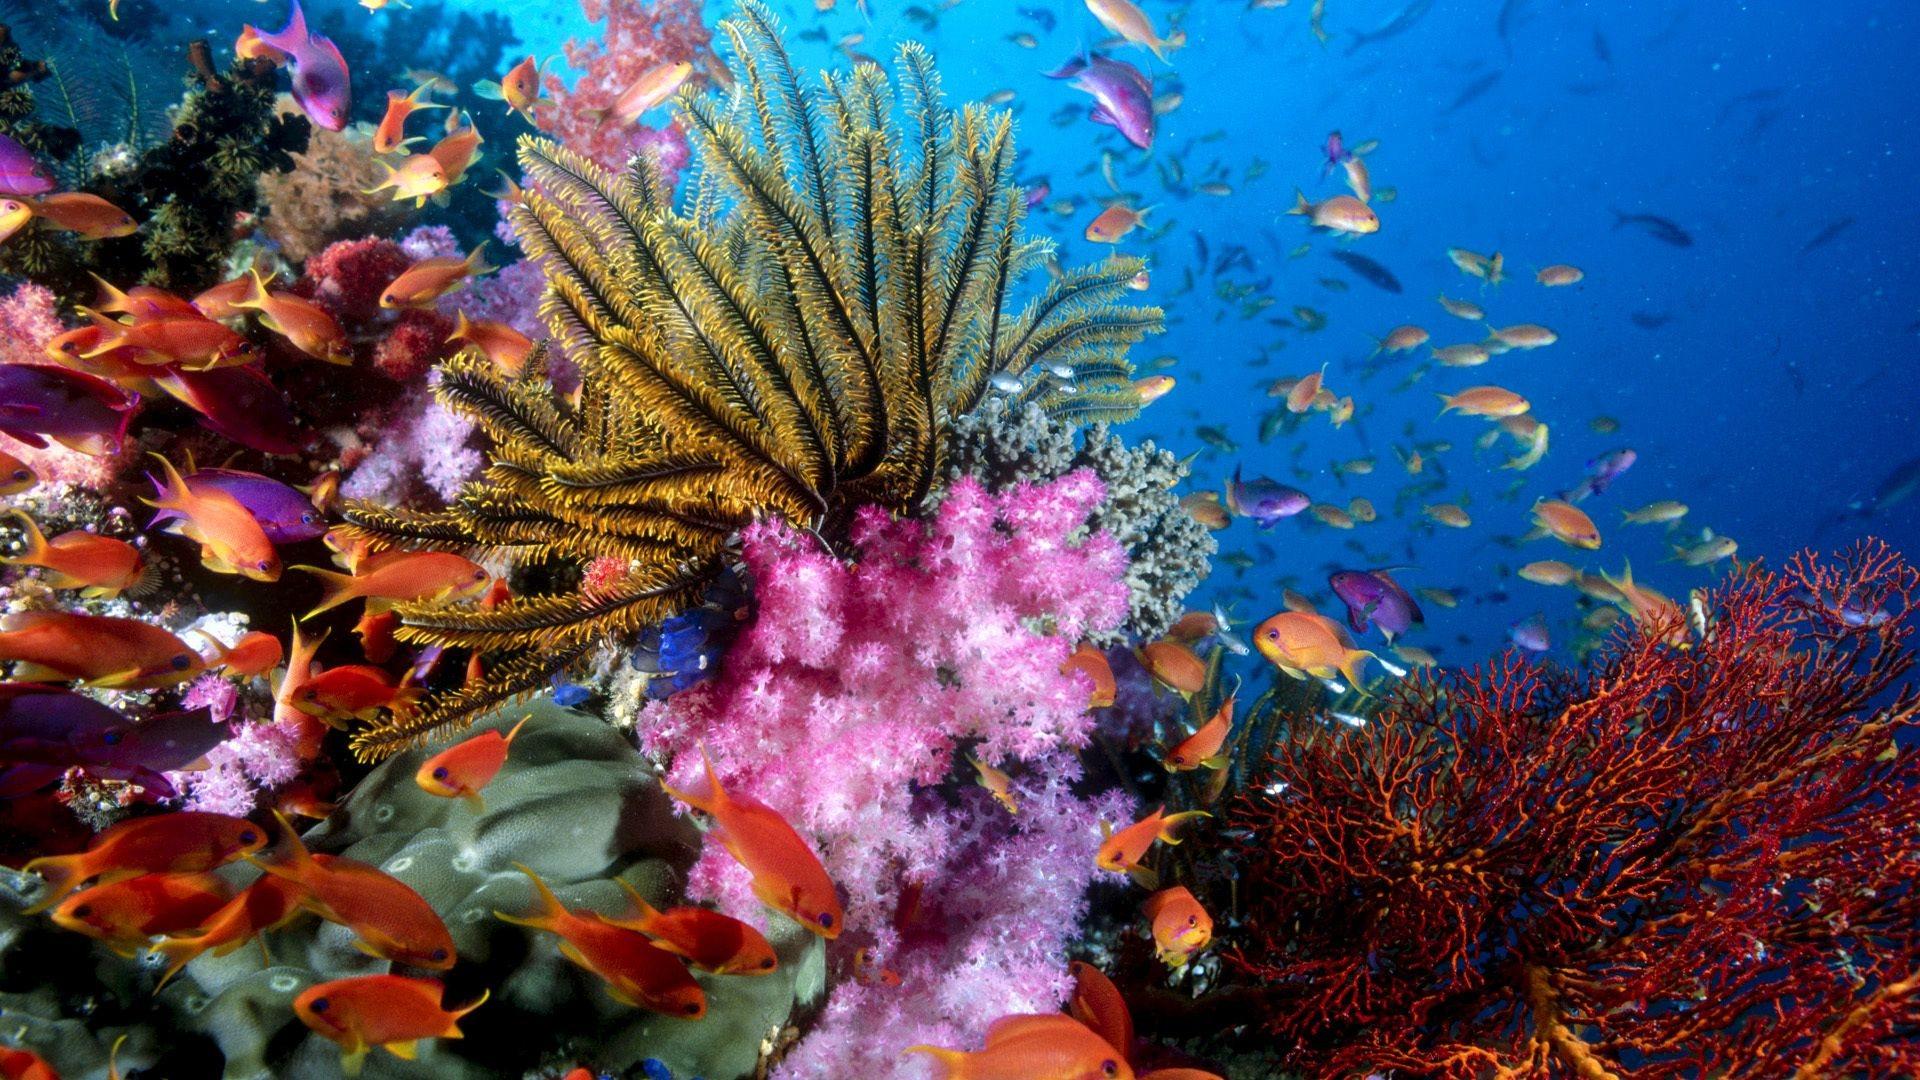 Coral Reef | Full HD Desktop Wallpapers 1080p